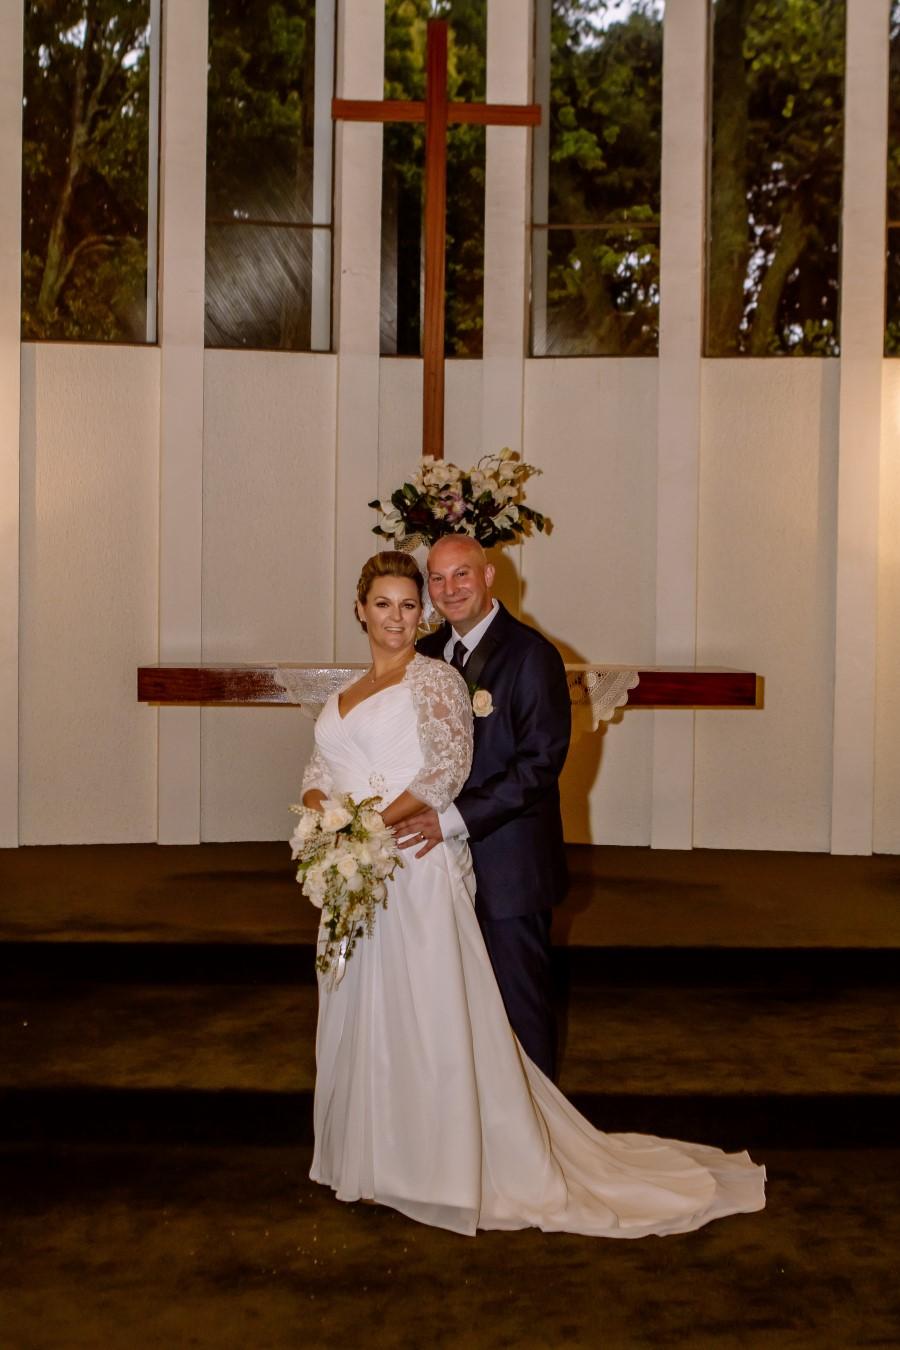 nz_wedding_st_leonards_mchughs-486